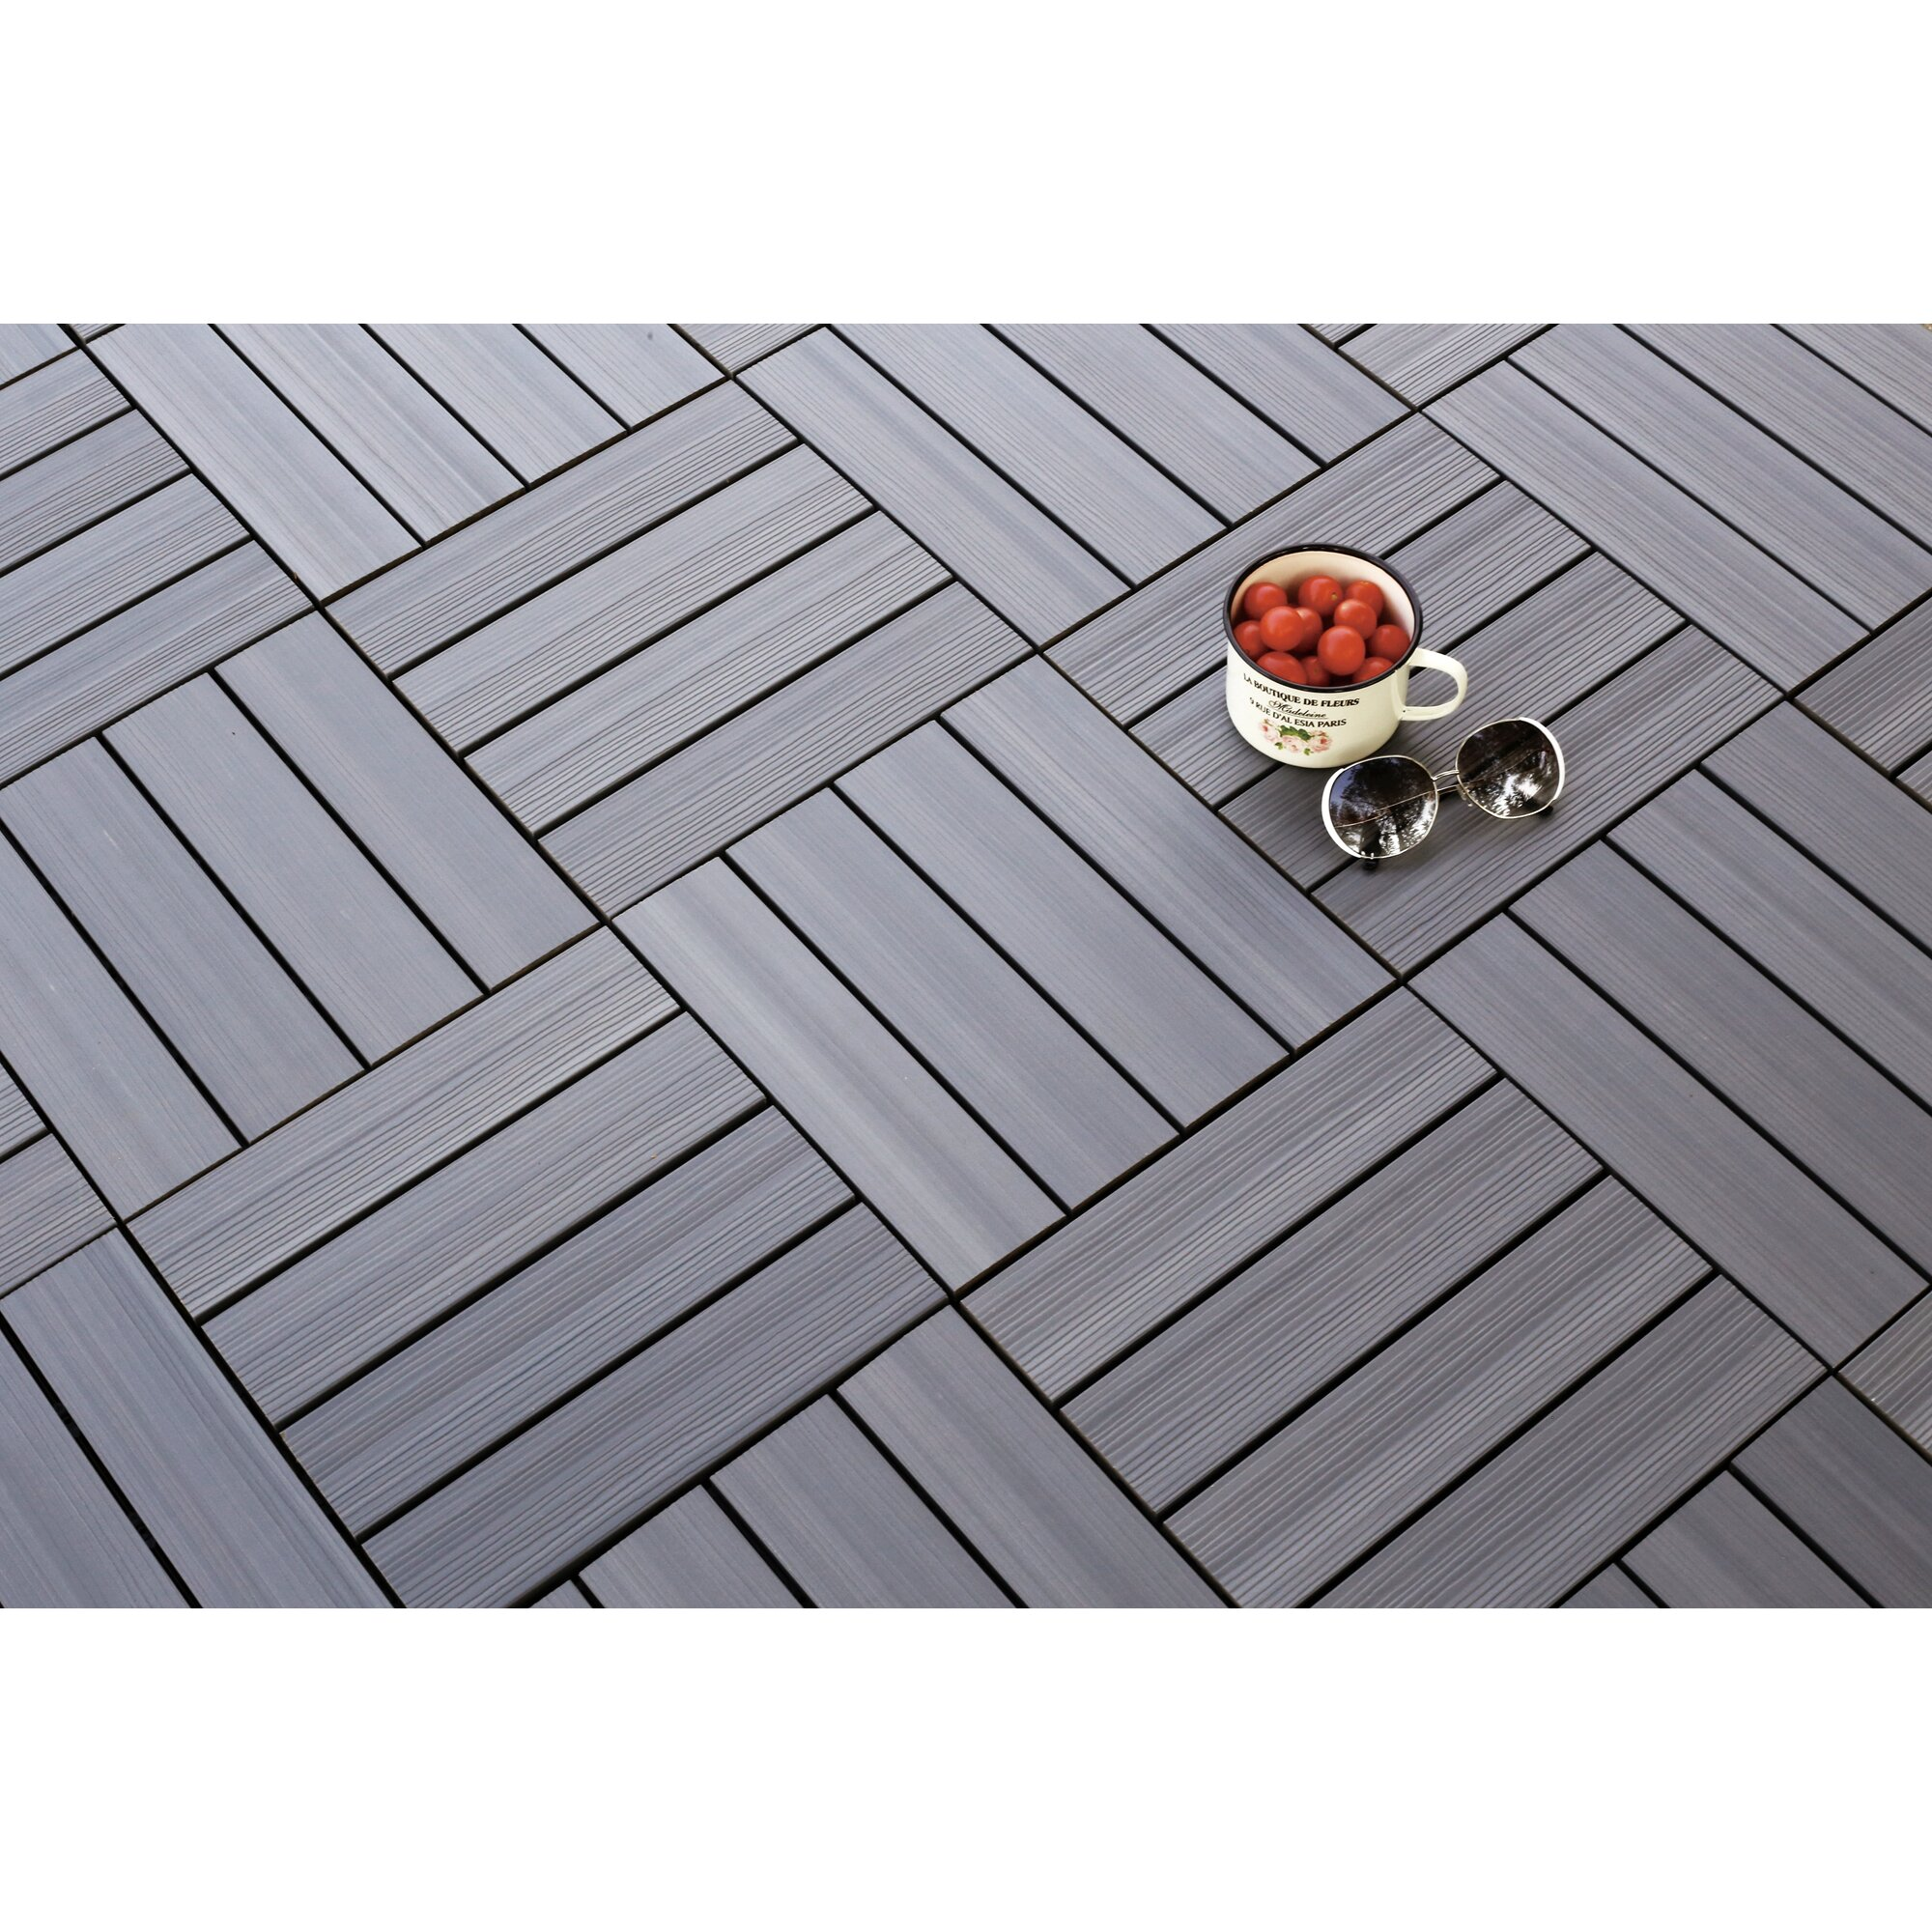 Newtechwood ultrashield westminster wood 12 x 12 outdoor for 12 x 12 wood floor tiles